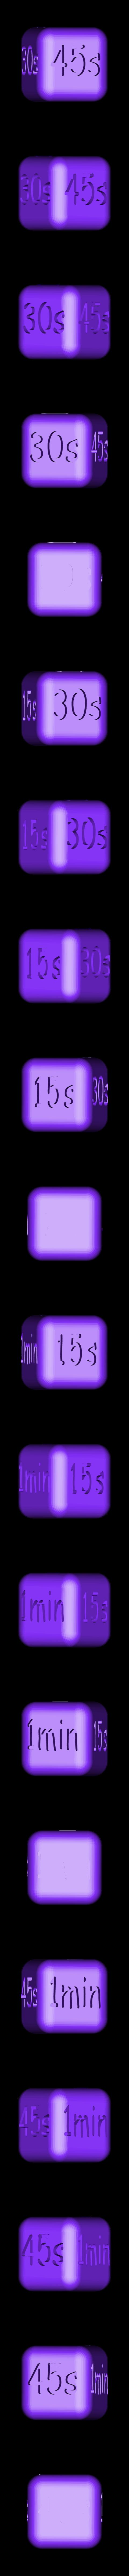 Dé tempsv2.STL Download STL file Naughty dice • 3D printable template, Overonez